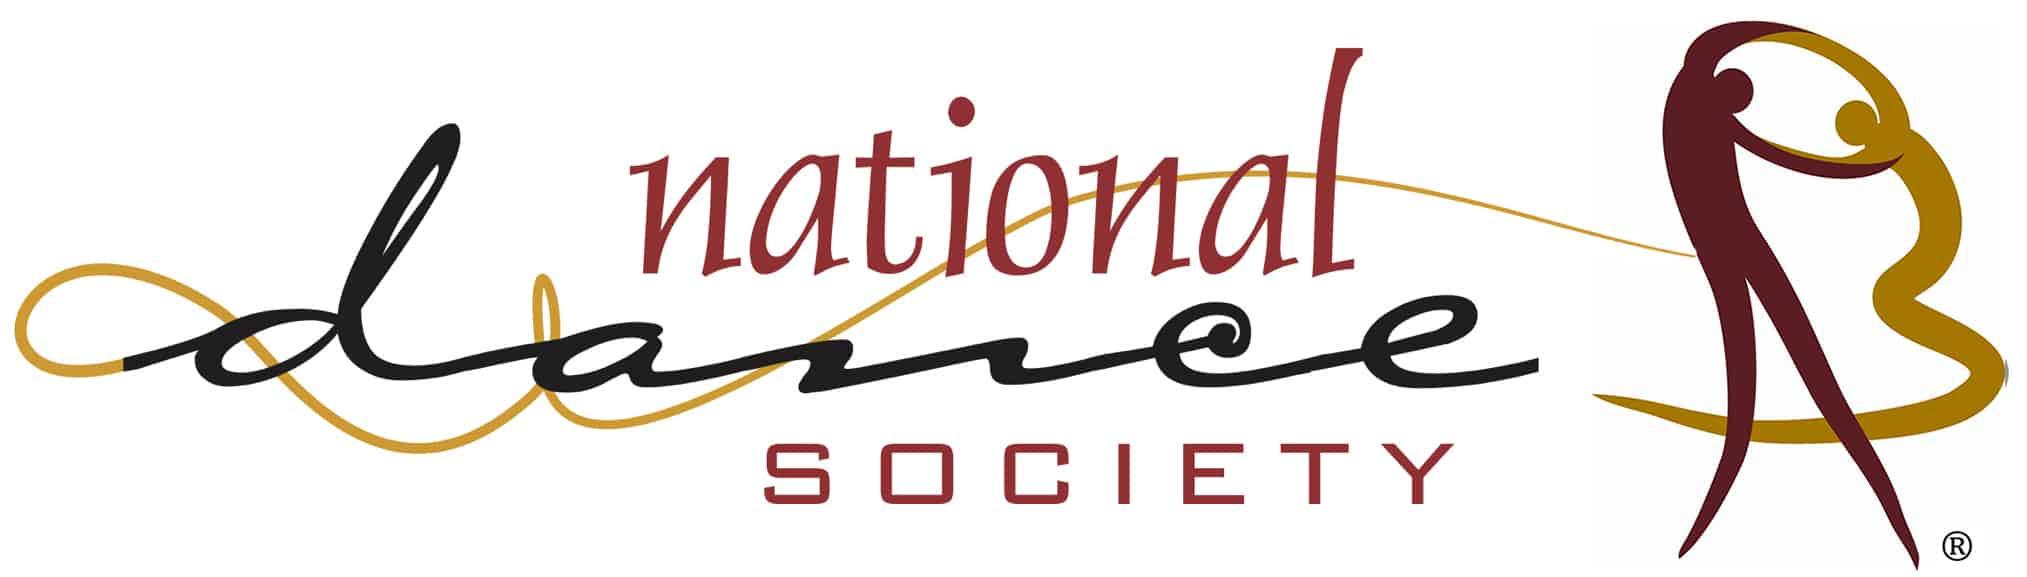 National Dance Society